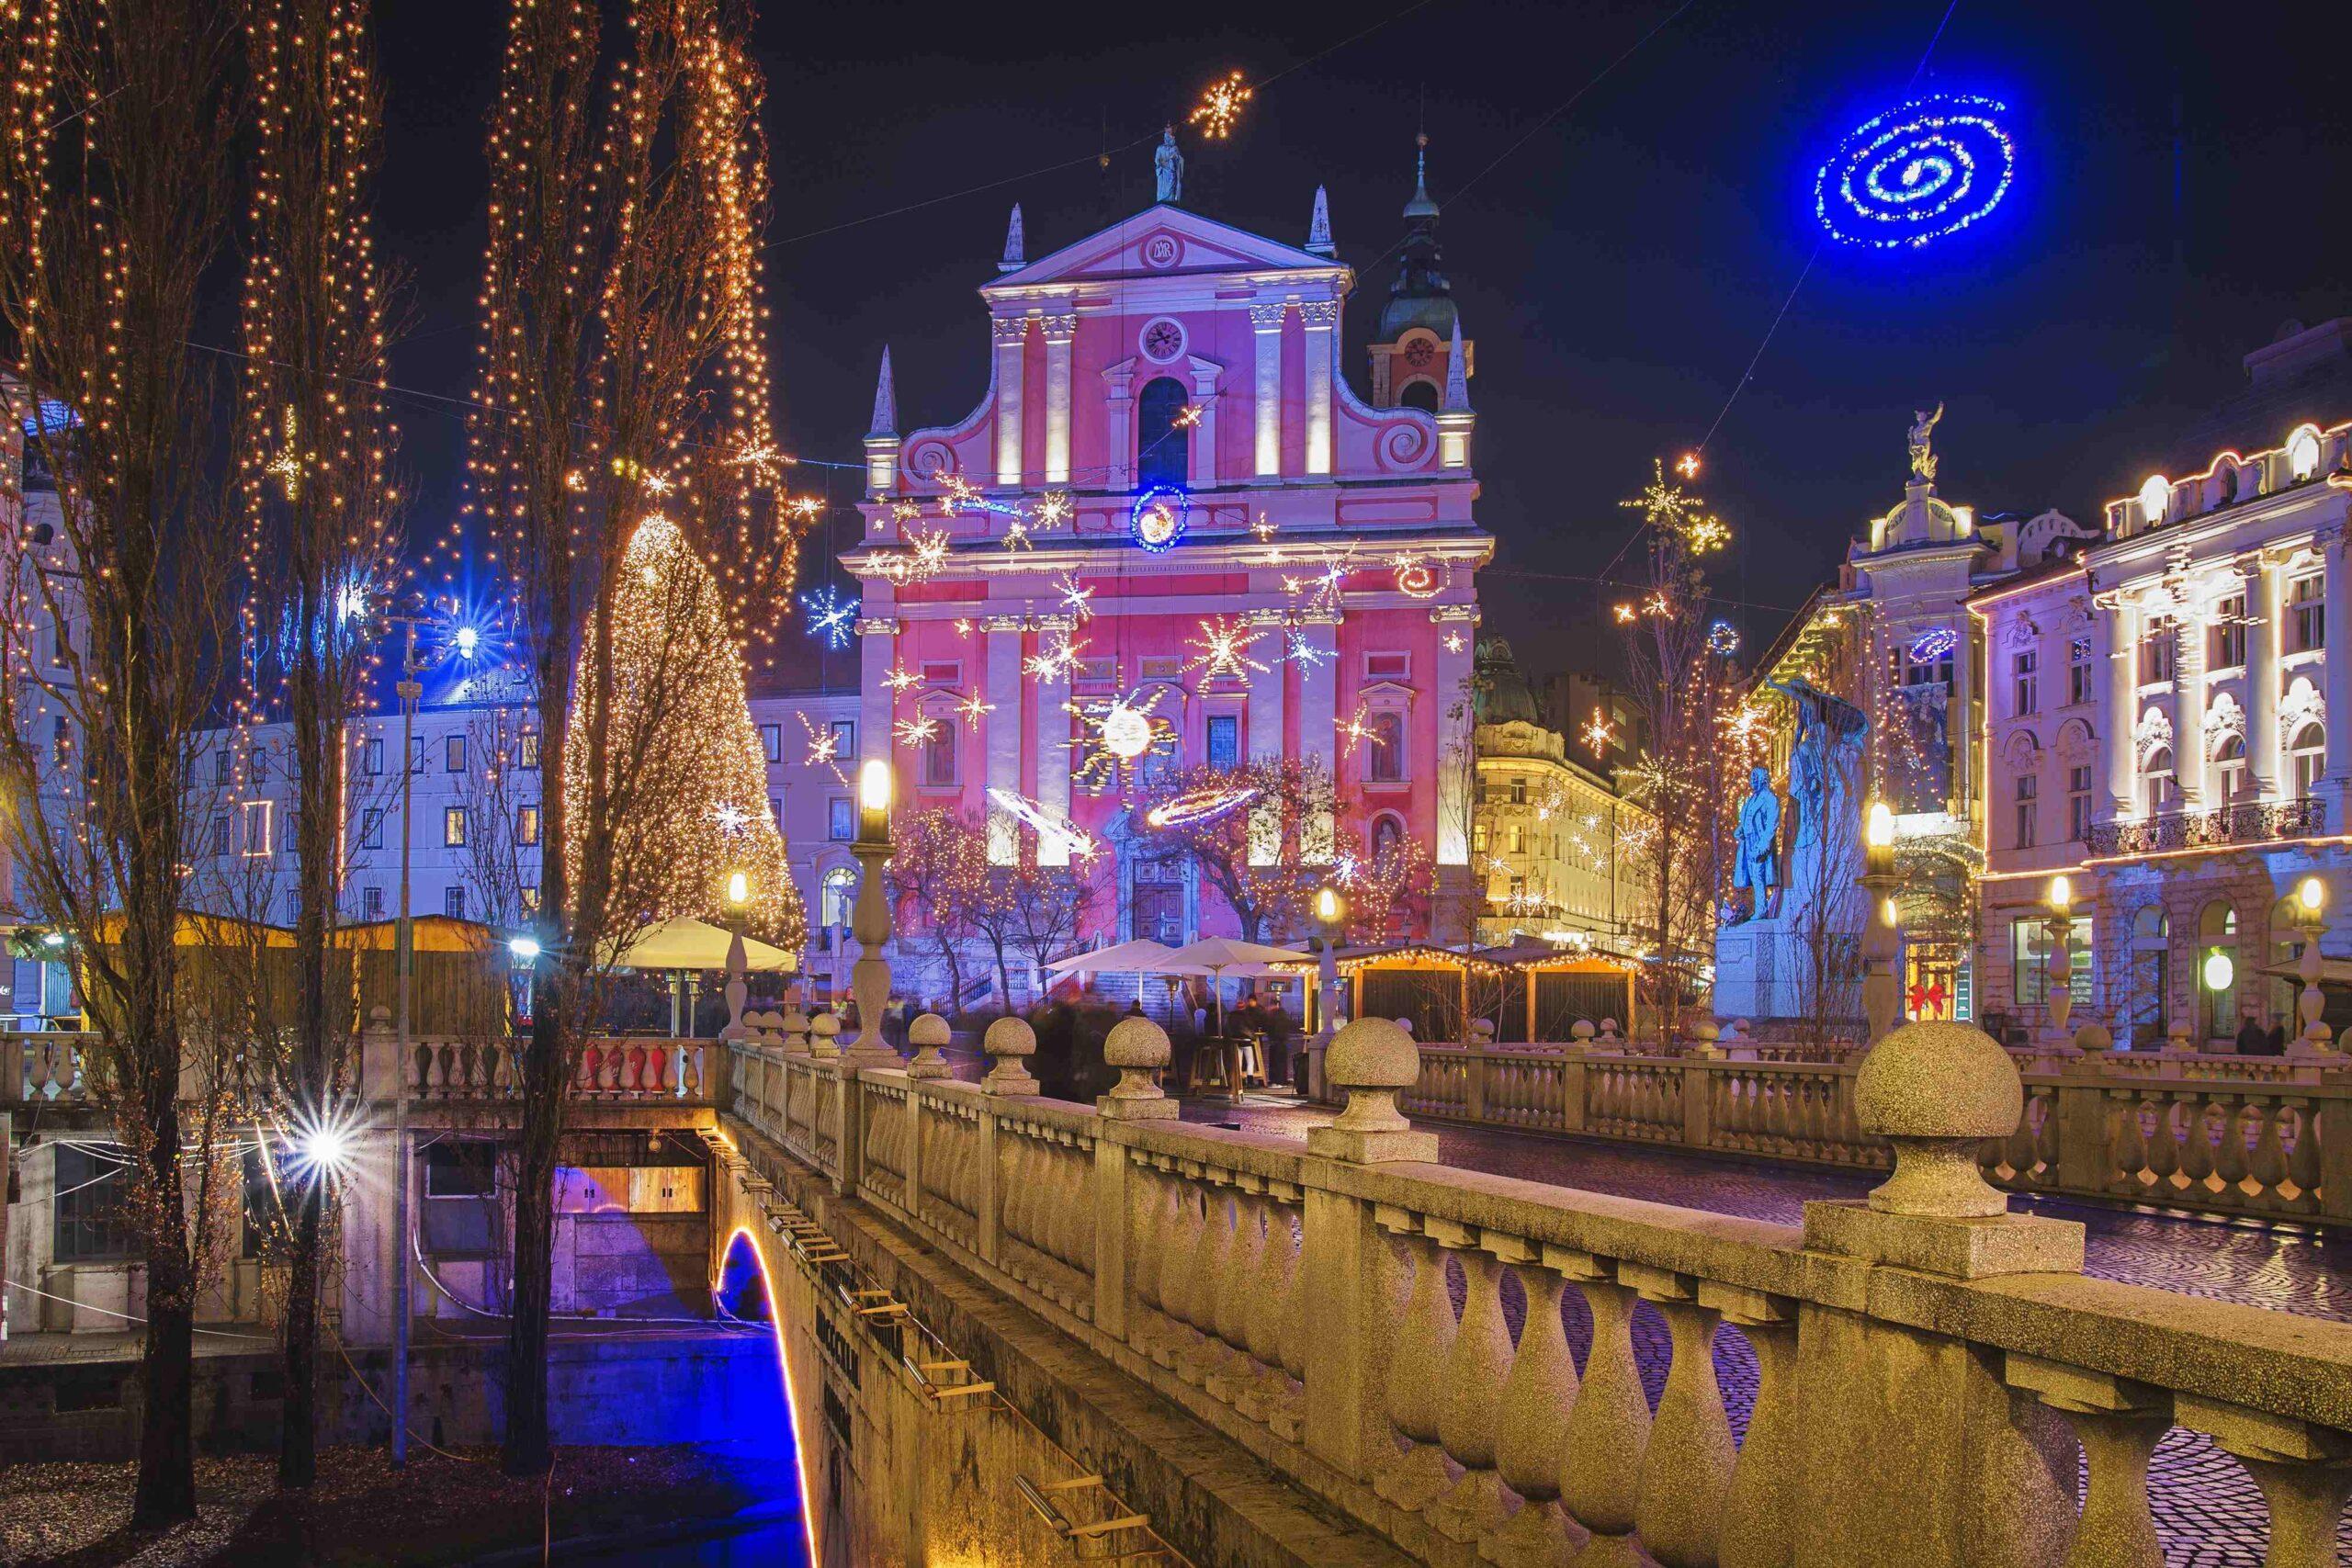 https://bsl.com.mt/wp-content/uploads/2021/09/Ljubljana-nw-scaled.jpg